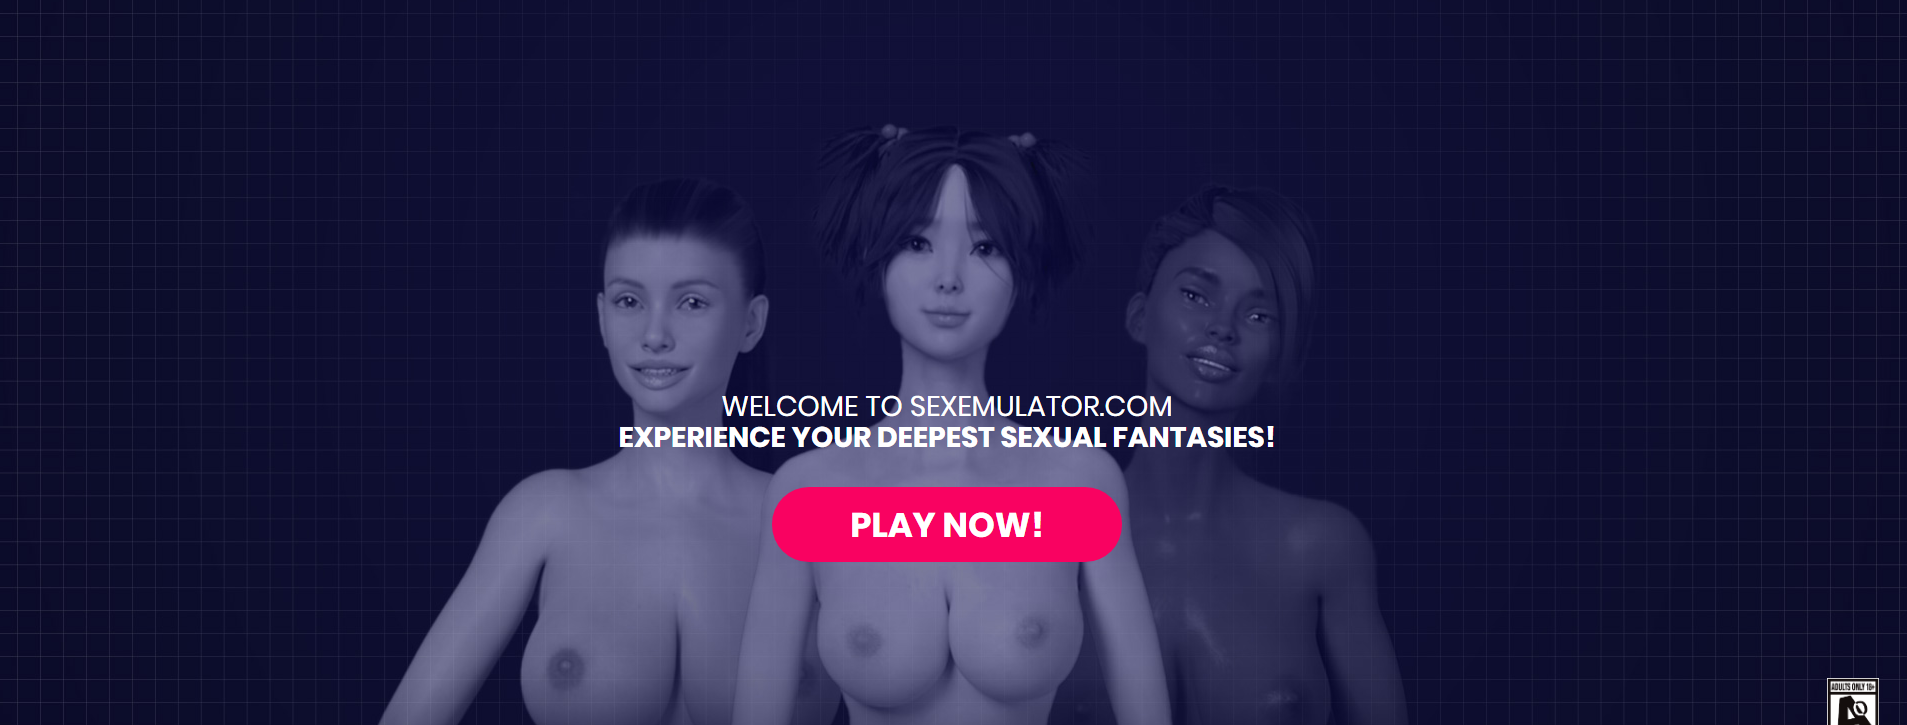 sexemulator featured